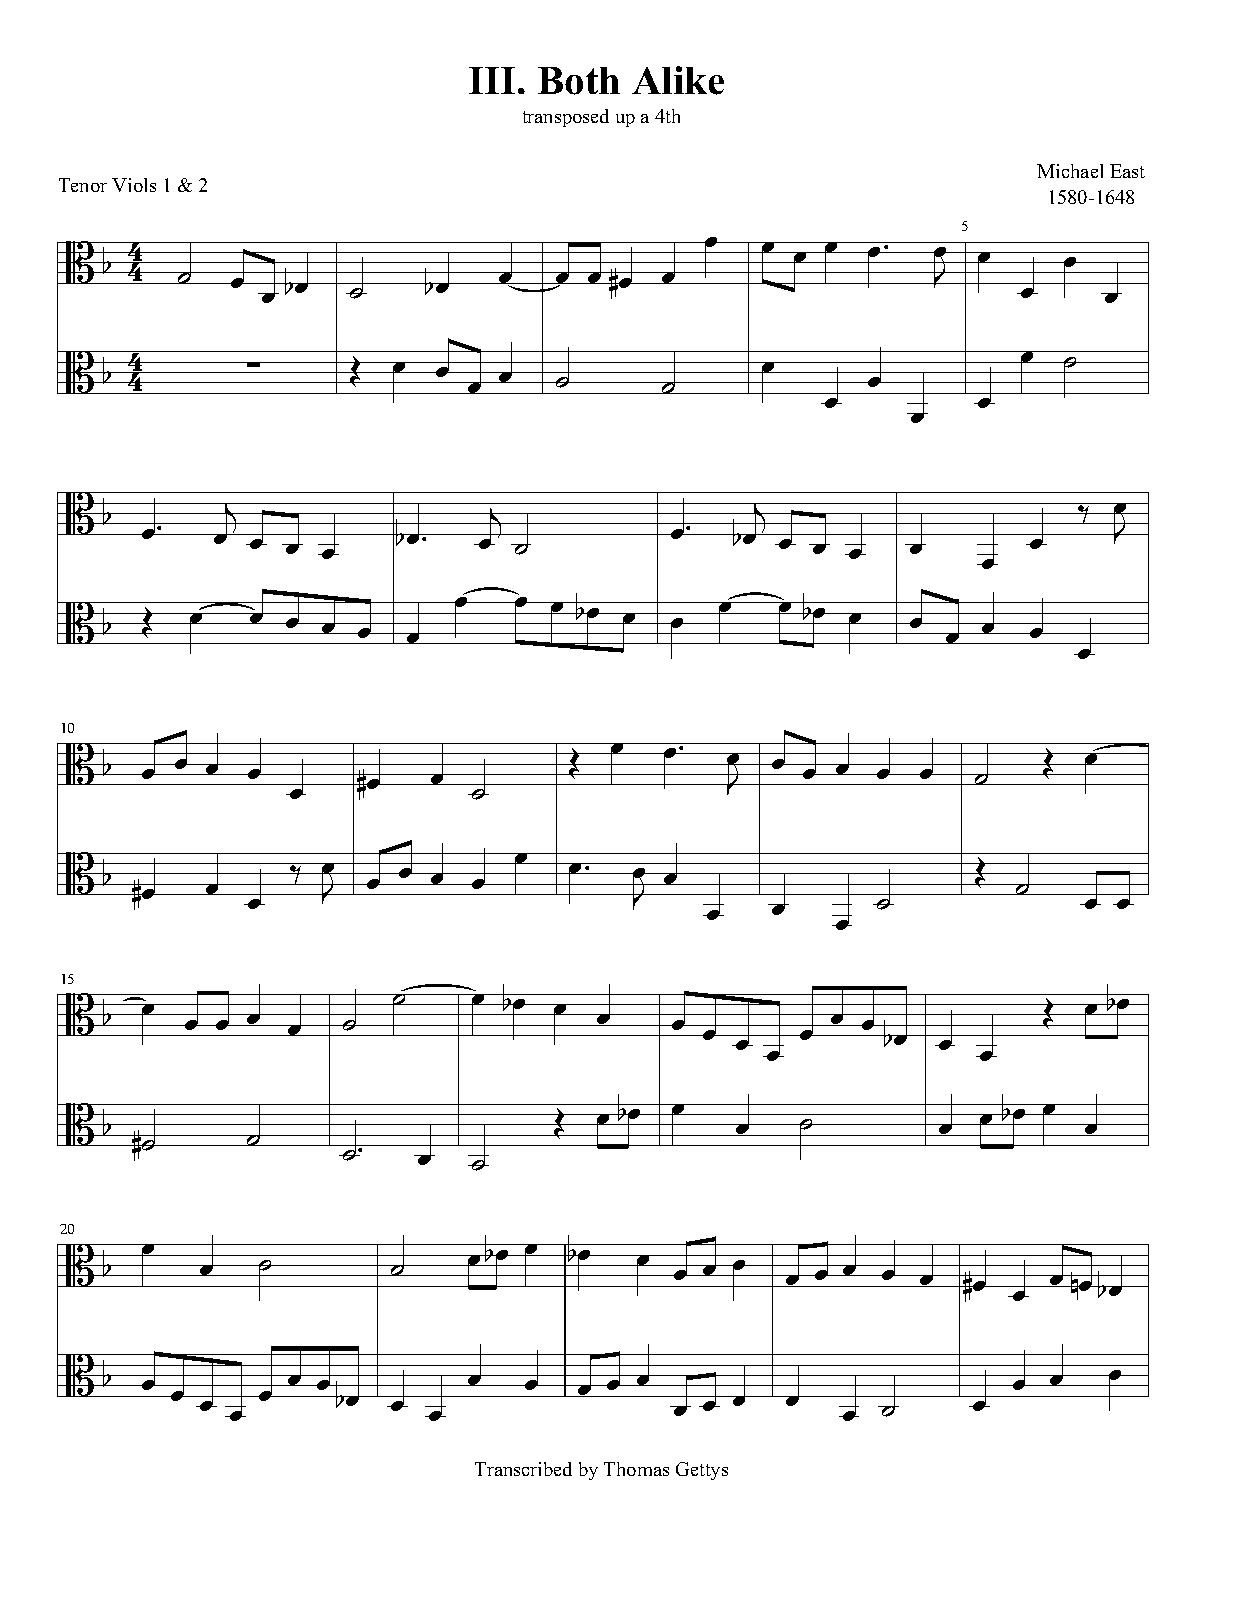 Both Alike (East, Michael) - IMSLP/Petrucci Music Library